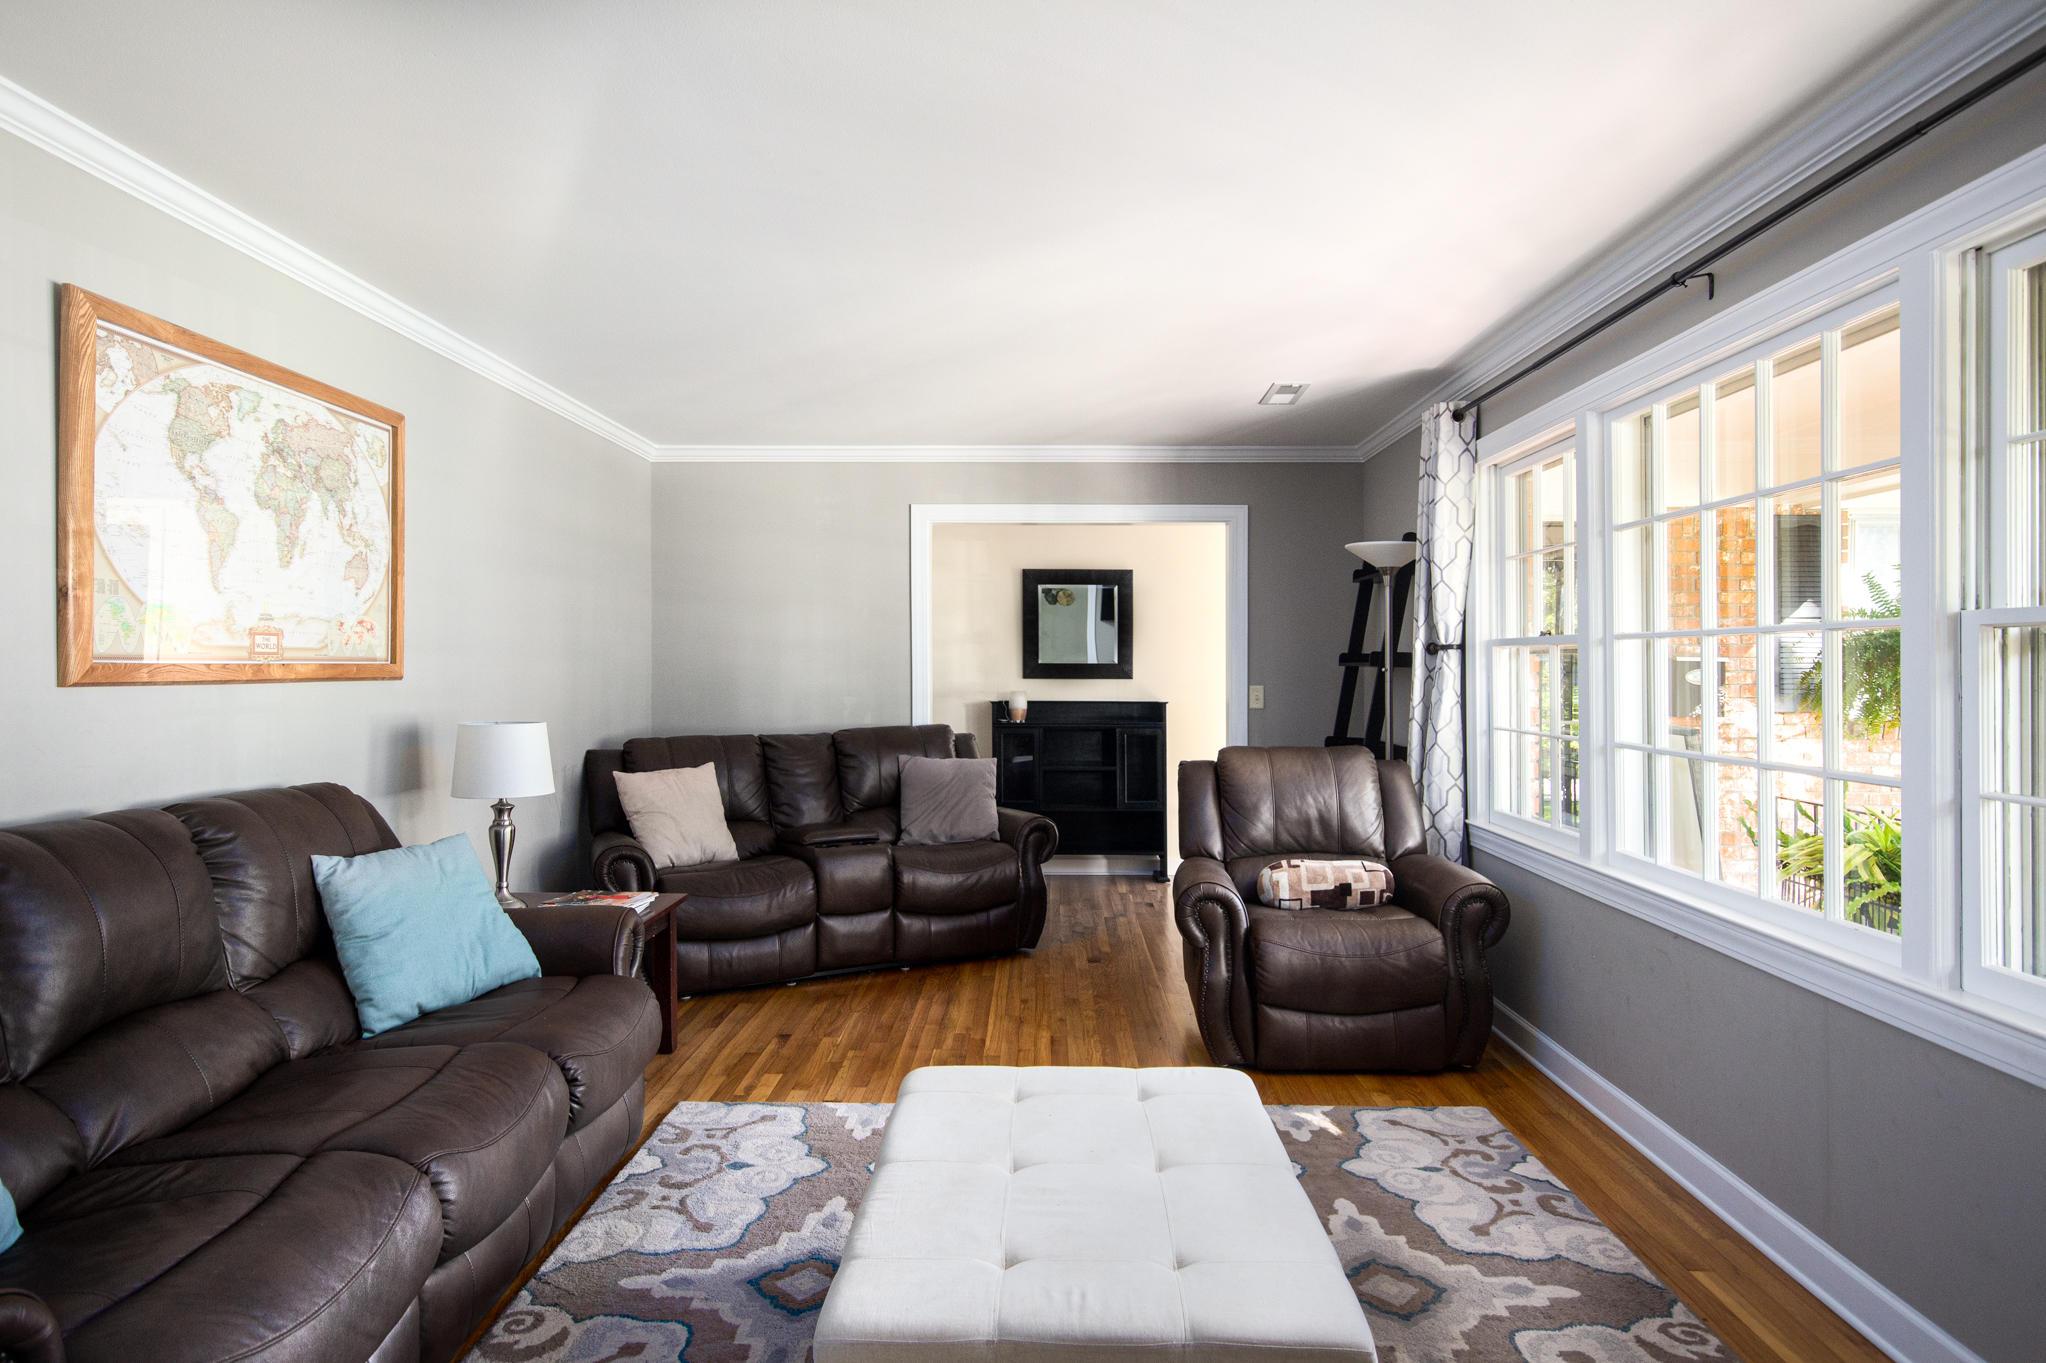 Belvedere Estates Homes For Sale - 6021 Rembert, Hanahan, SC - 11